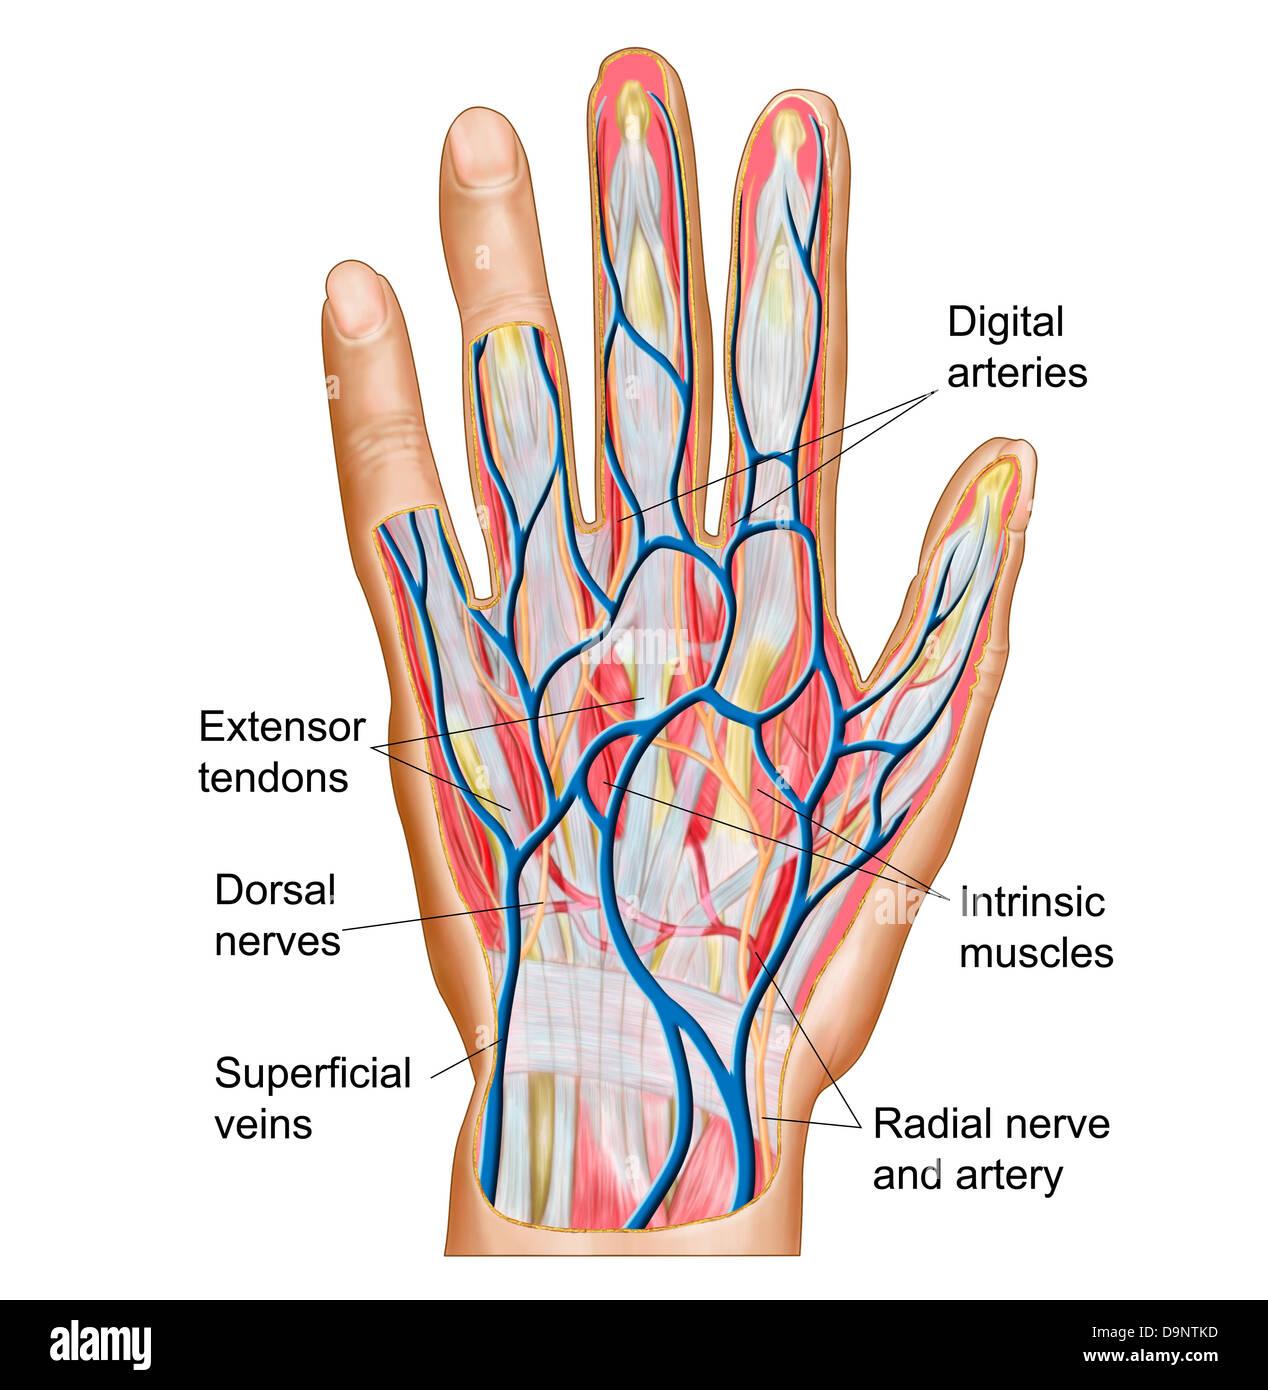 Anatomy Of Back Of Human Hand Stock Photo 57643361 Alamy